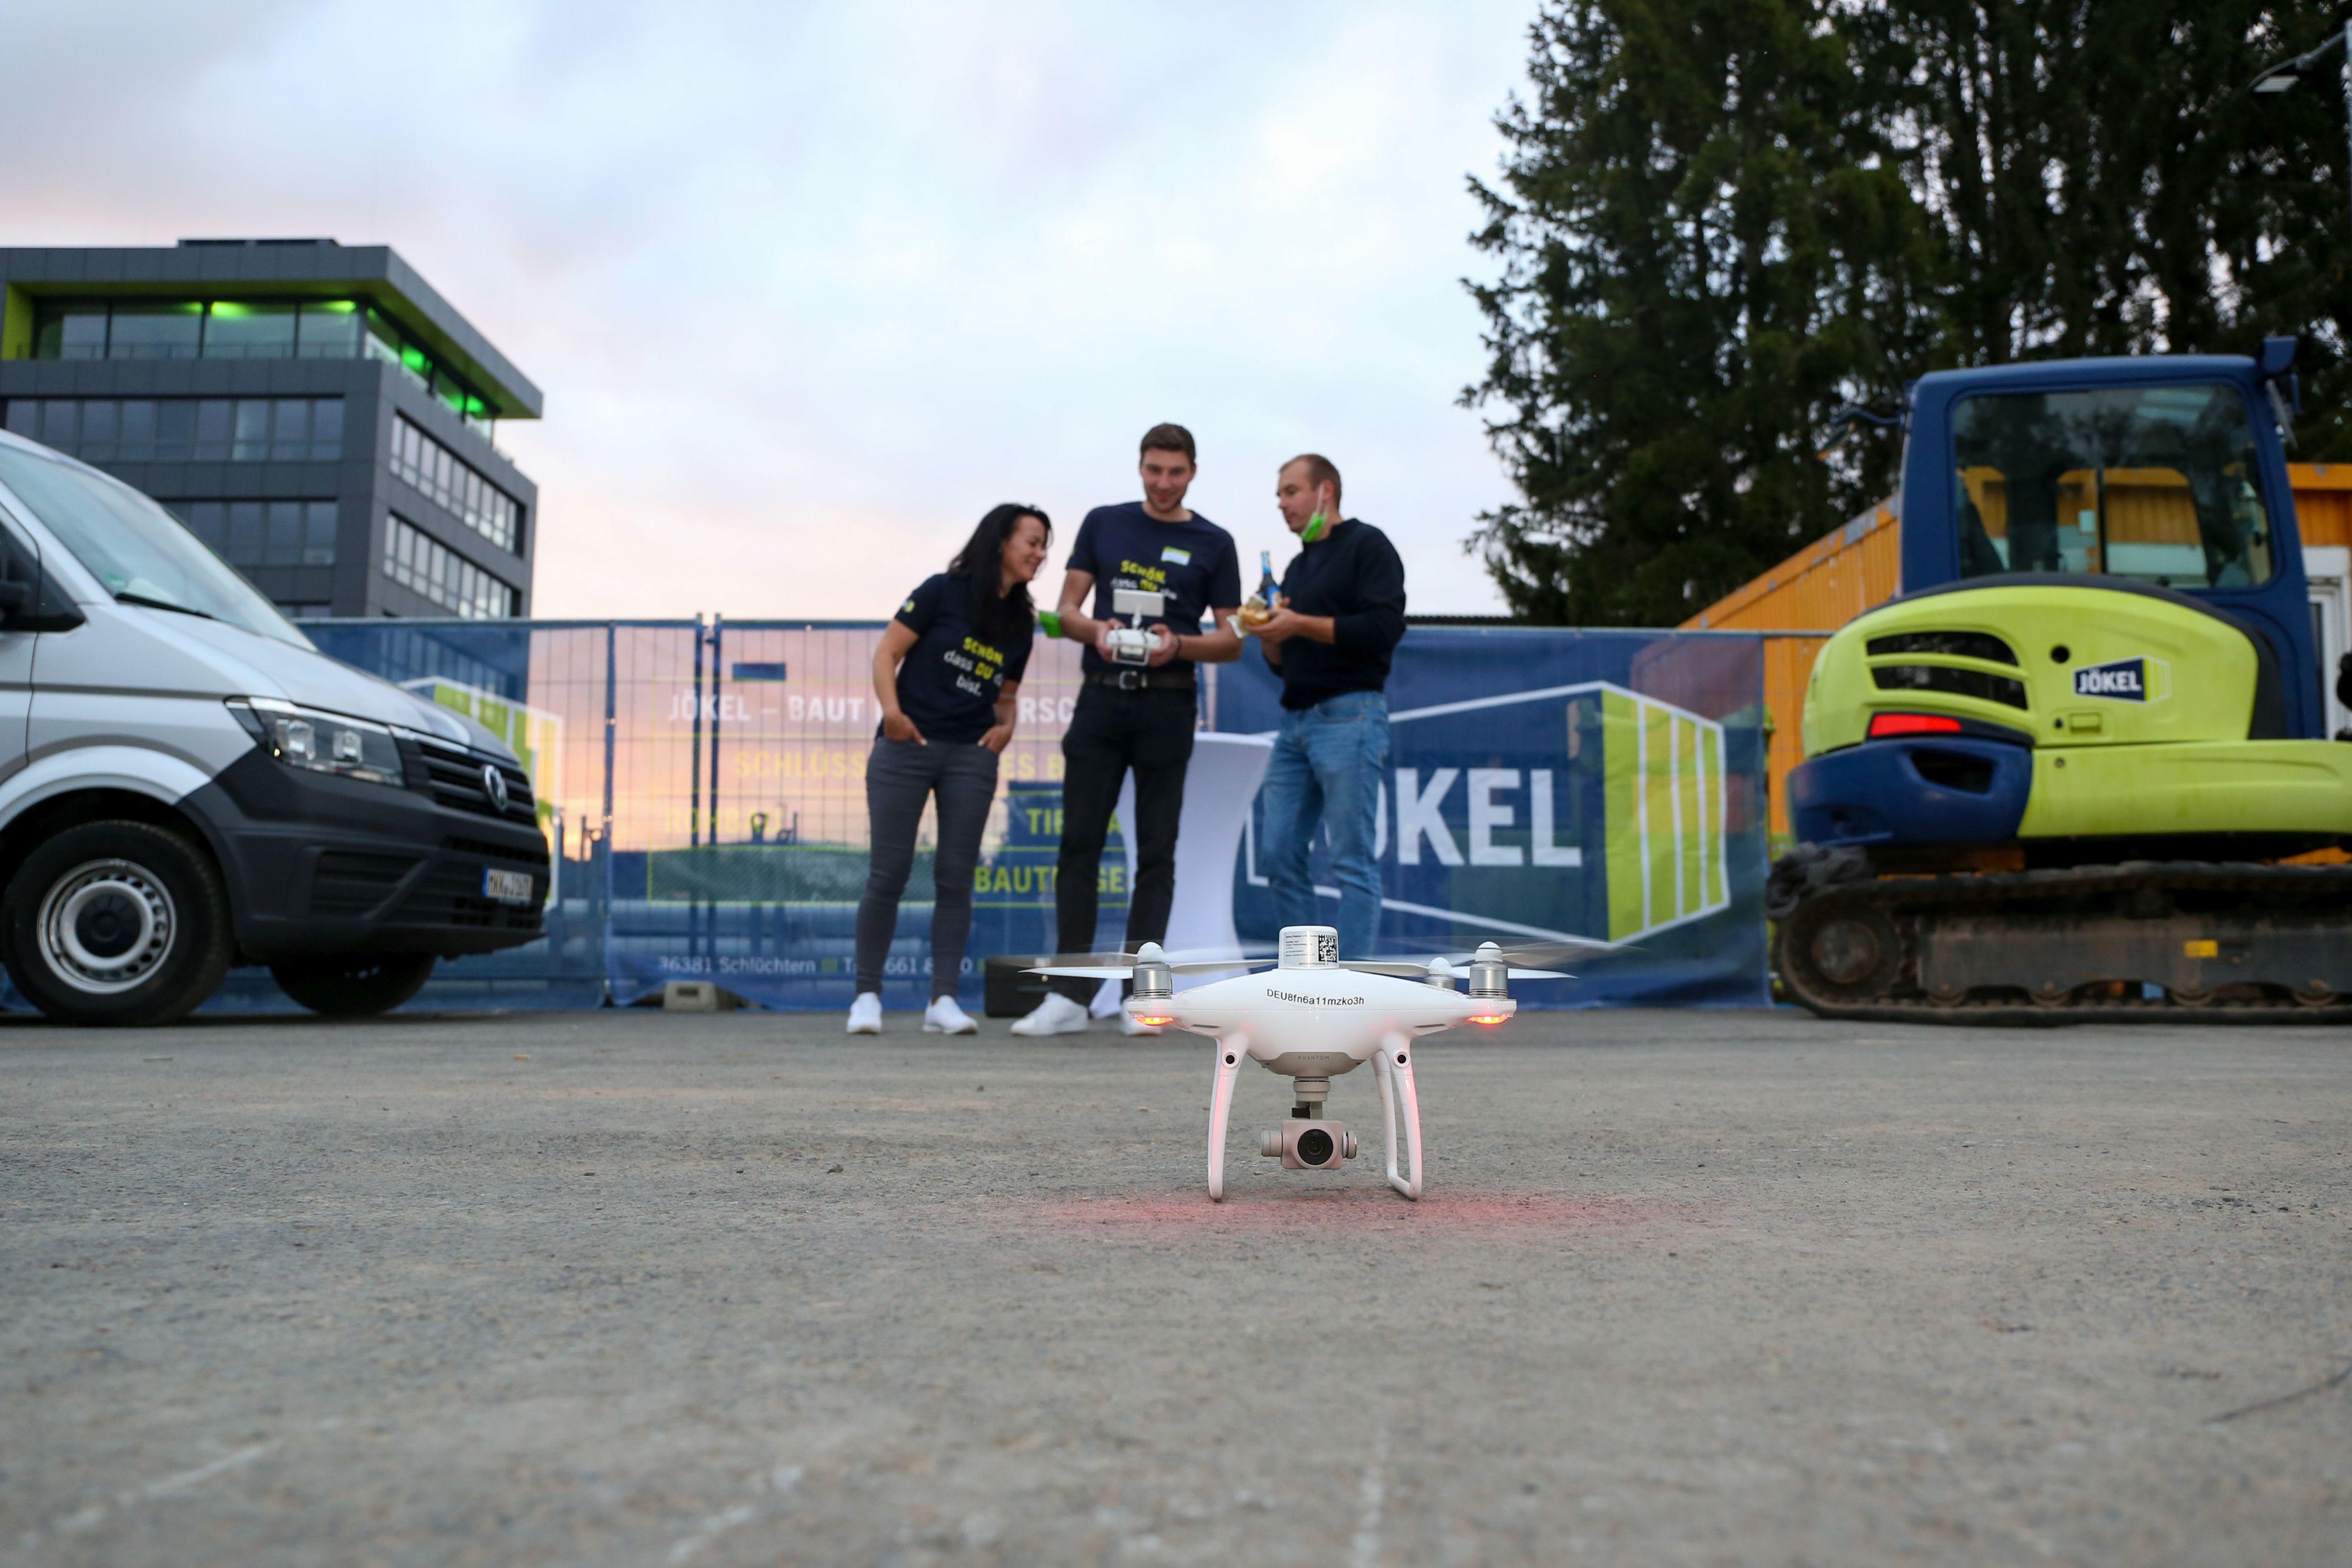 Jökel_Nacht der Ausbildung_Drohnenflug.jpg